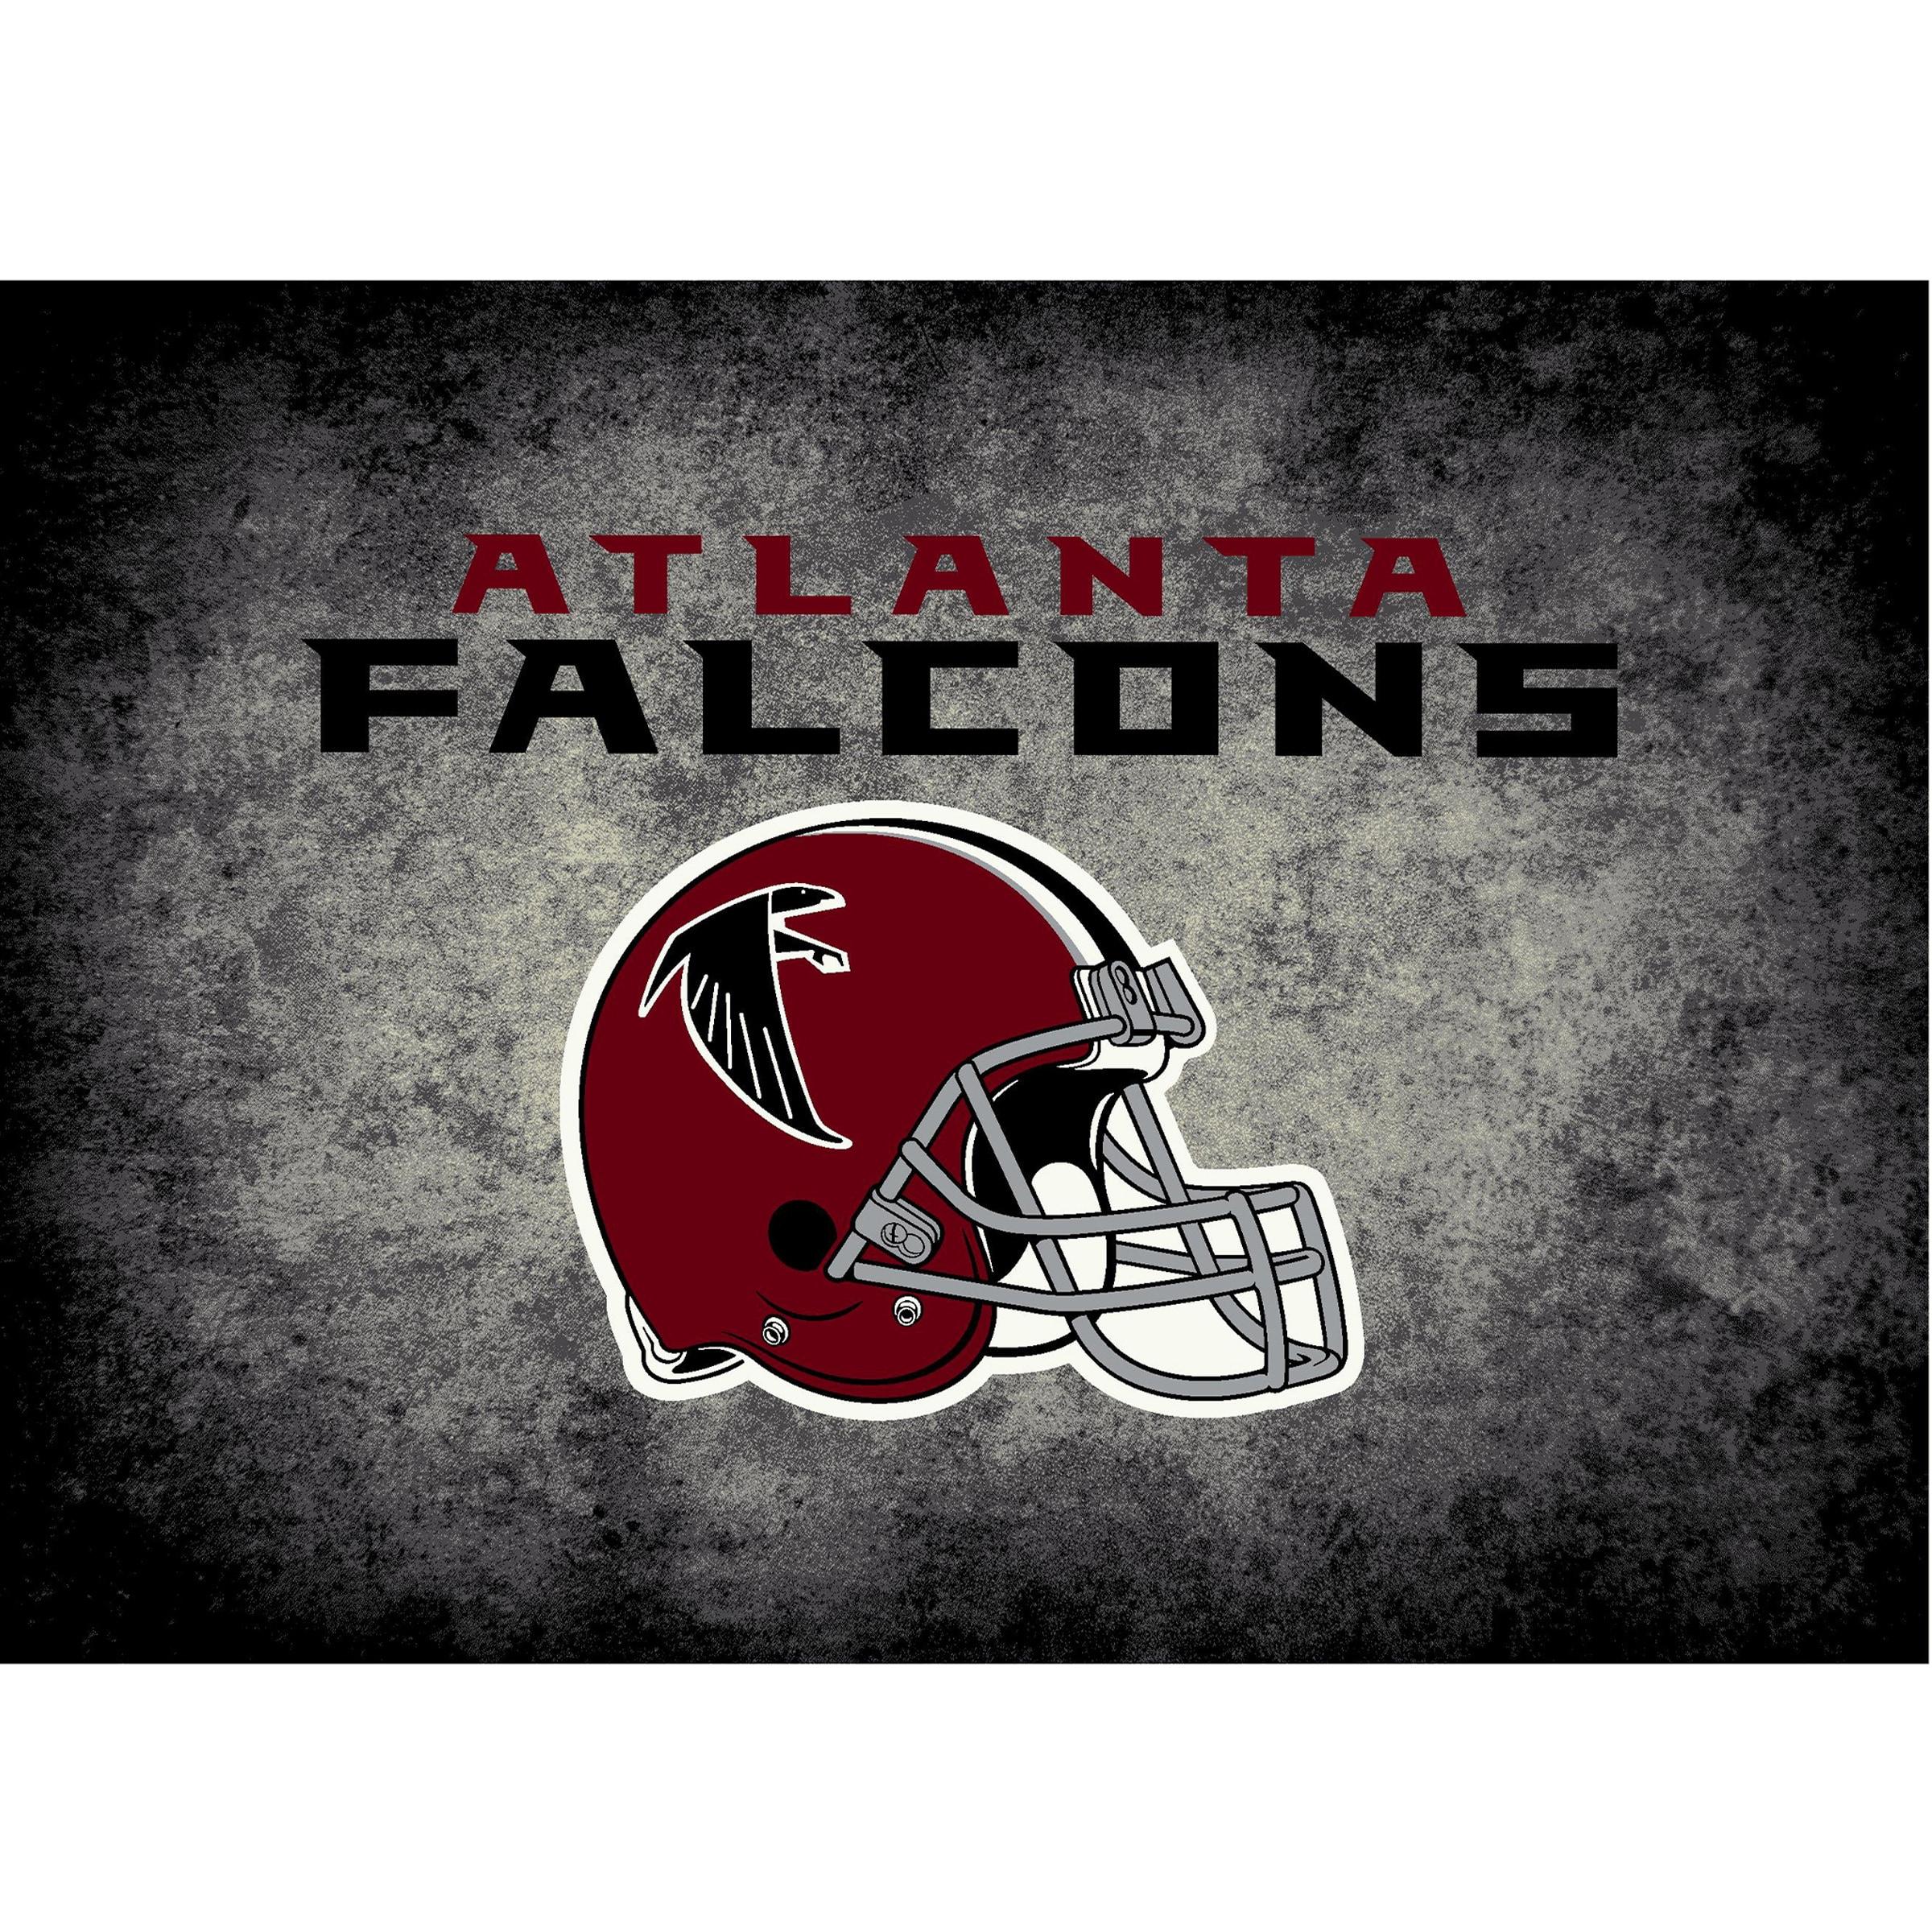 Atlanta Falcons Imperial 4' x 6' Distressed Rug